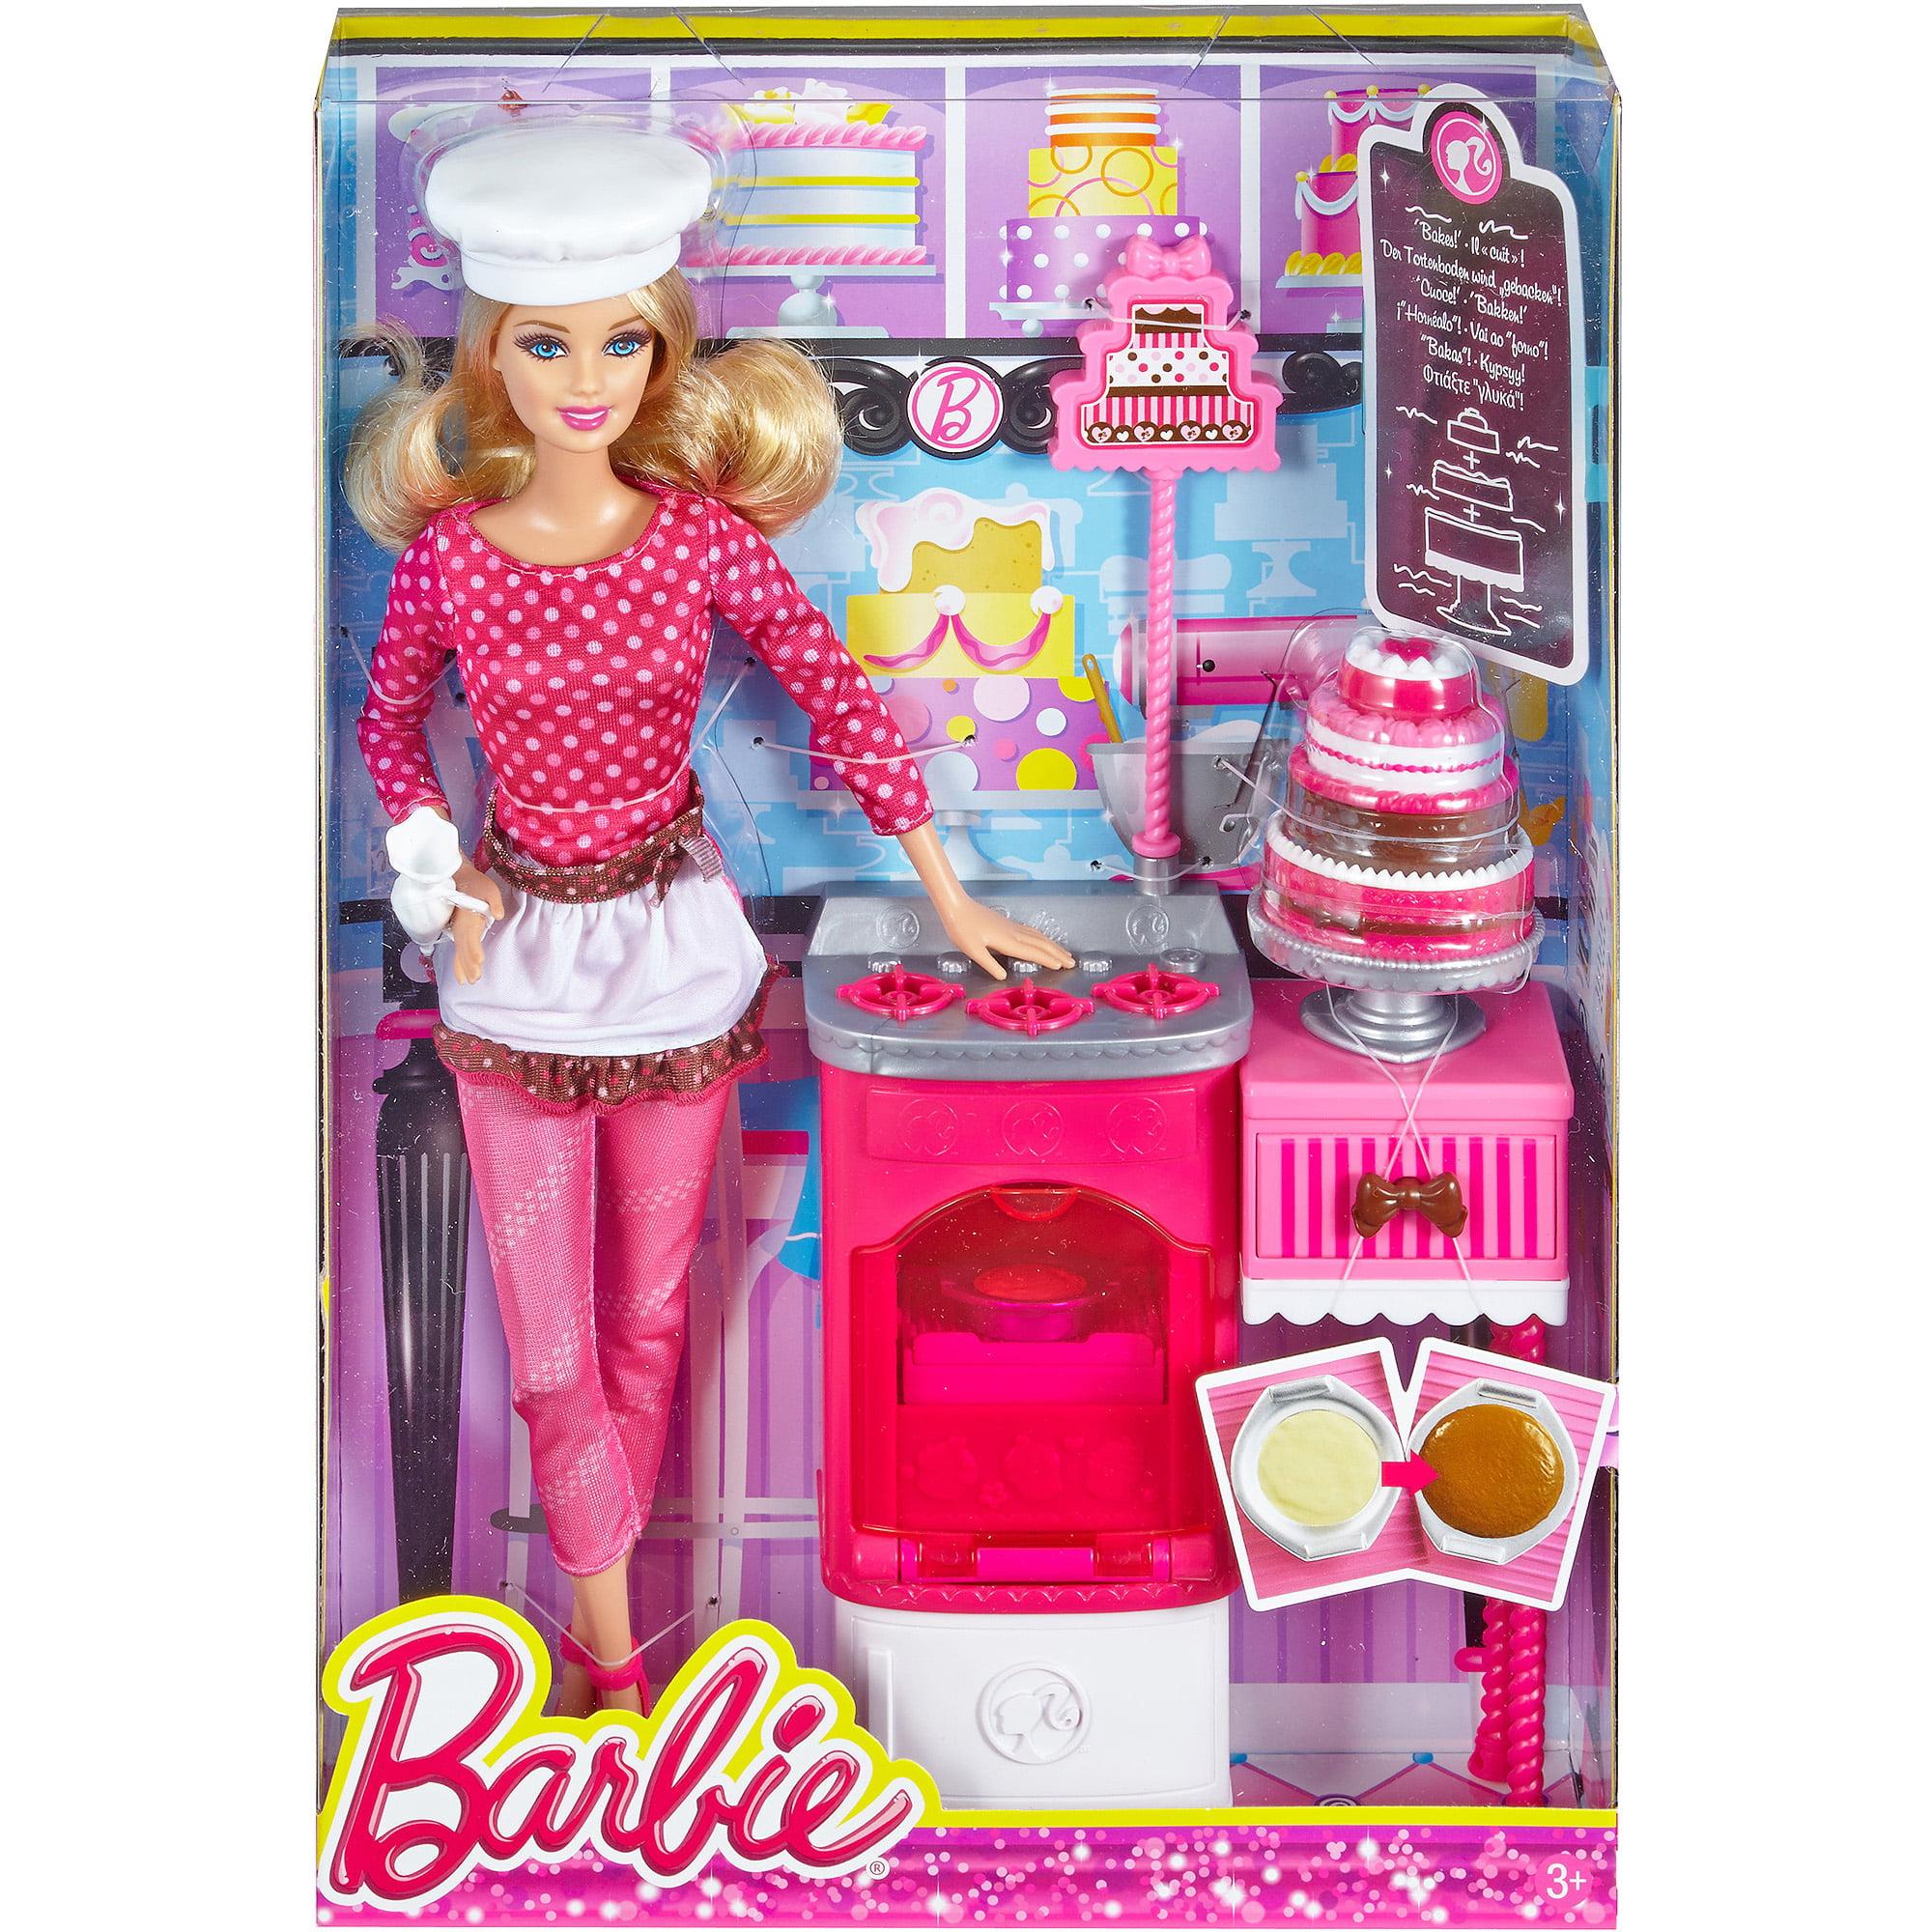 Barbie Careers Complete Play Cake Decorator Set Walmart Com